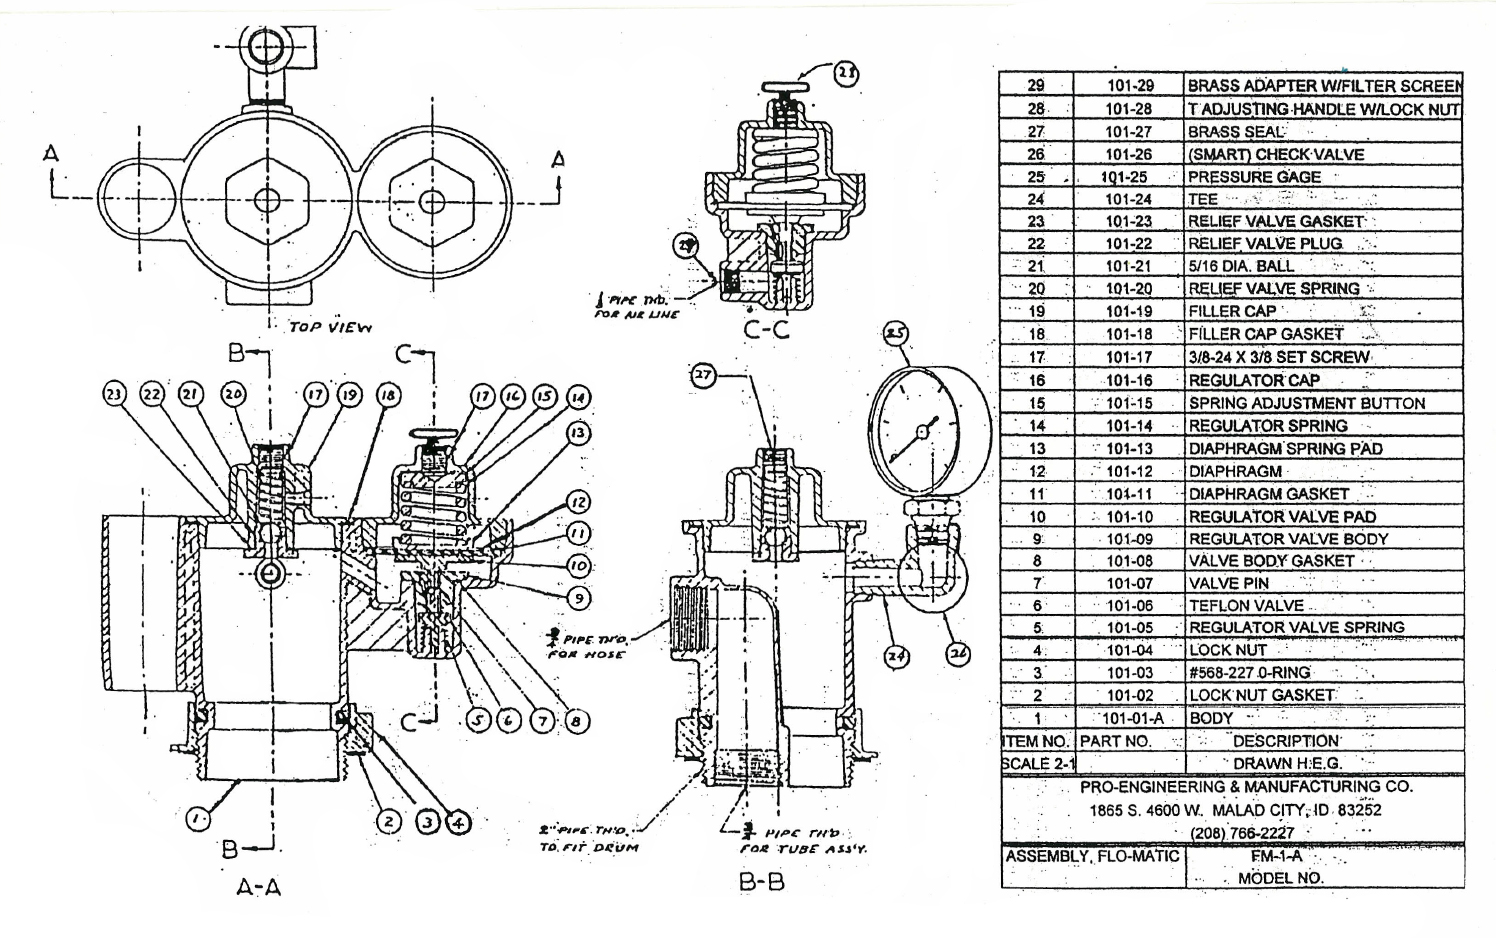 Parts List Marlin Model 1894 Diagram